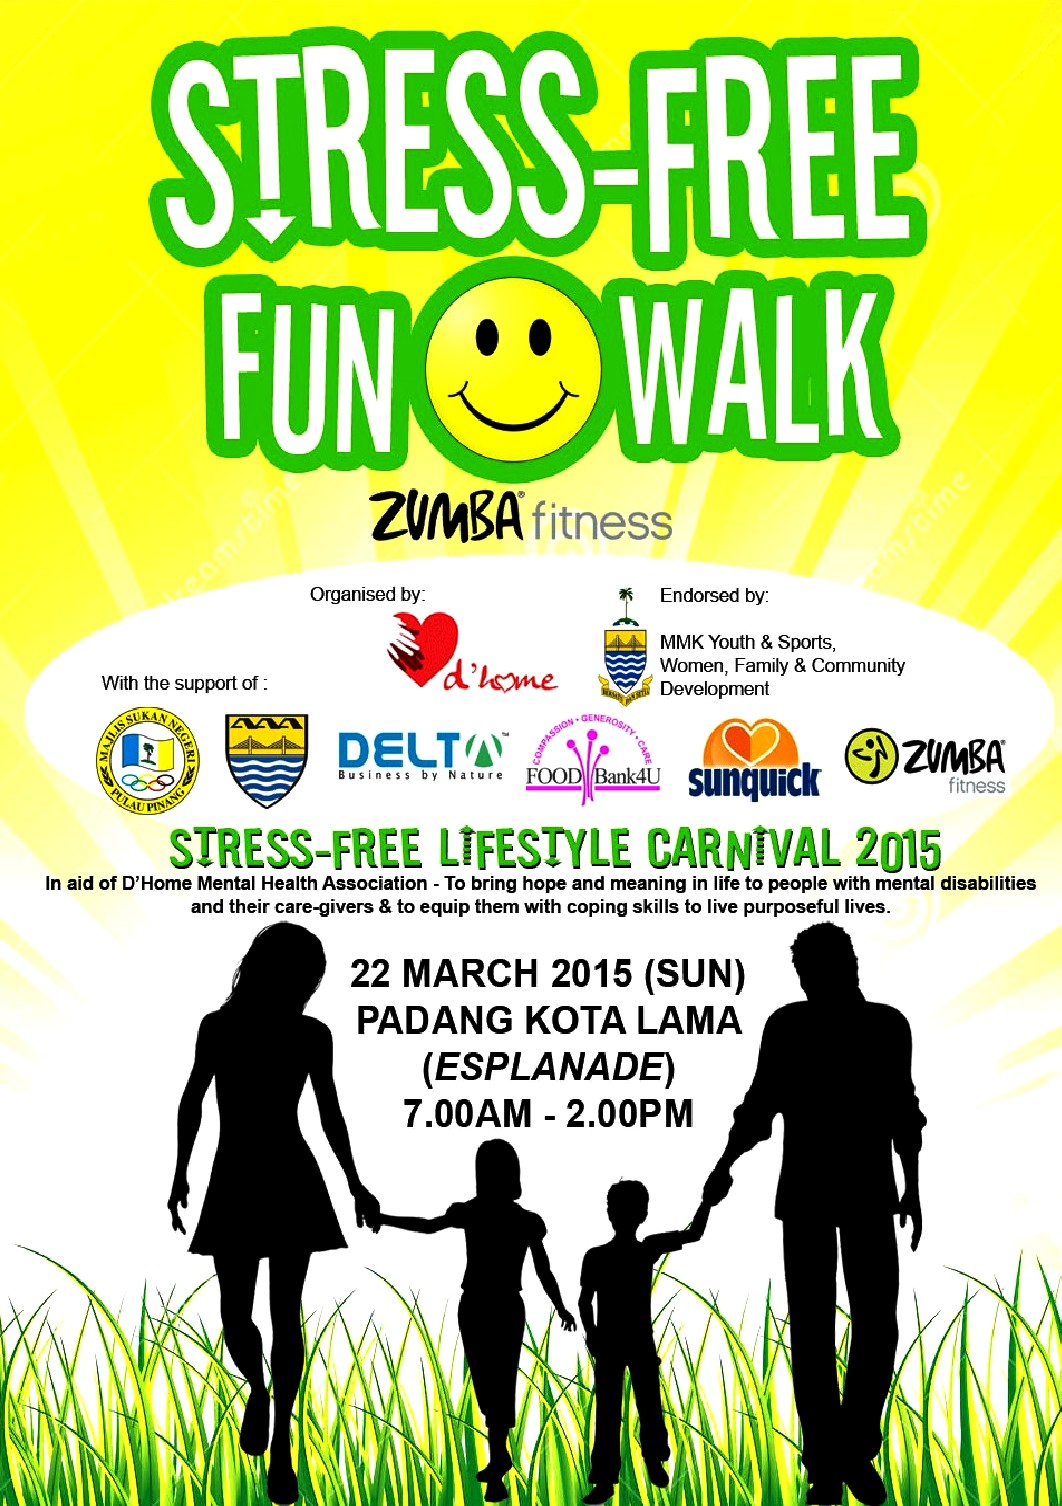 Fun Walk & Zumba brochure and form Page 1